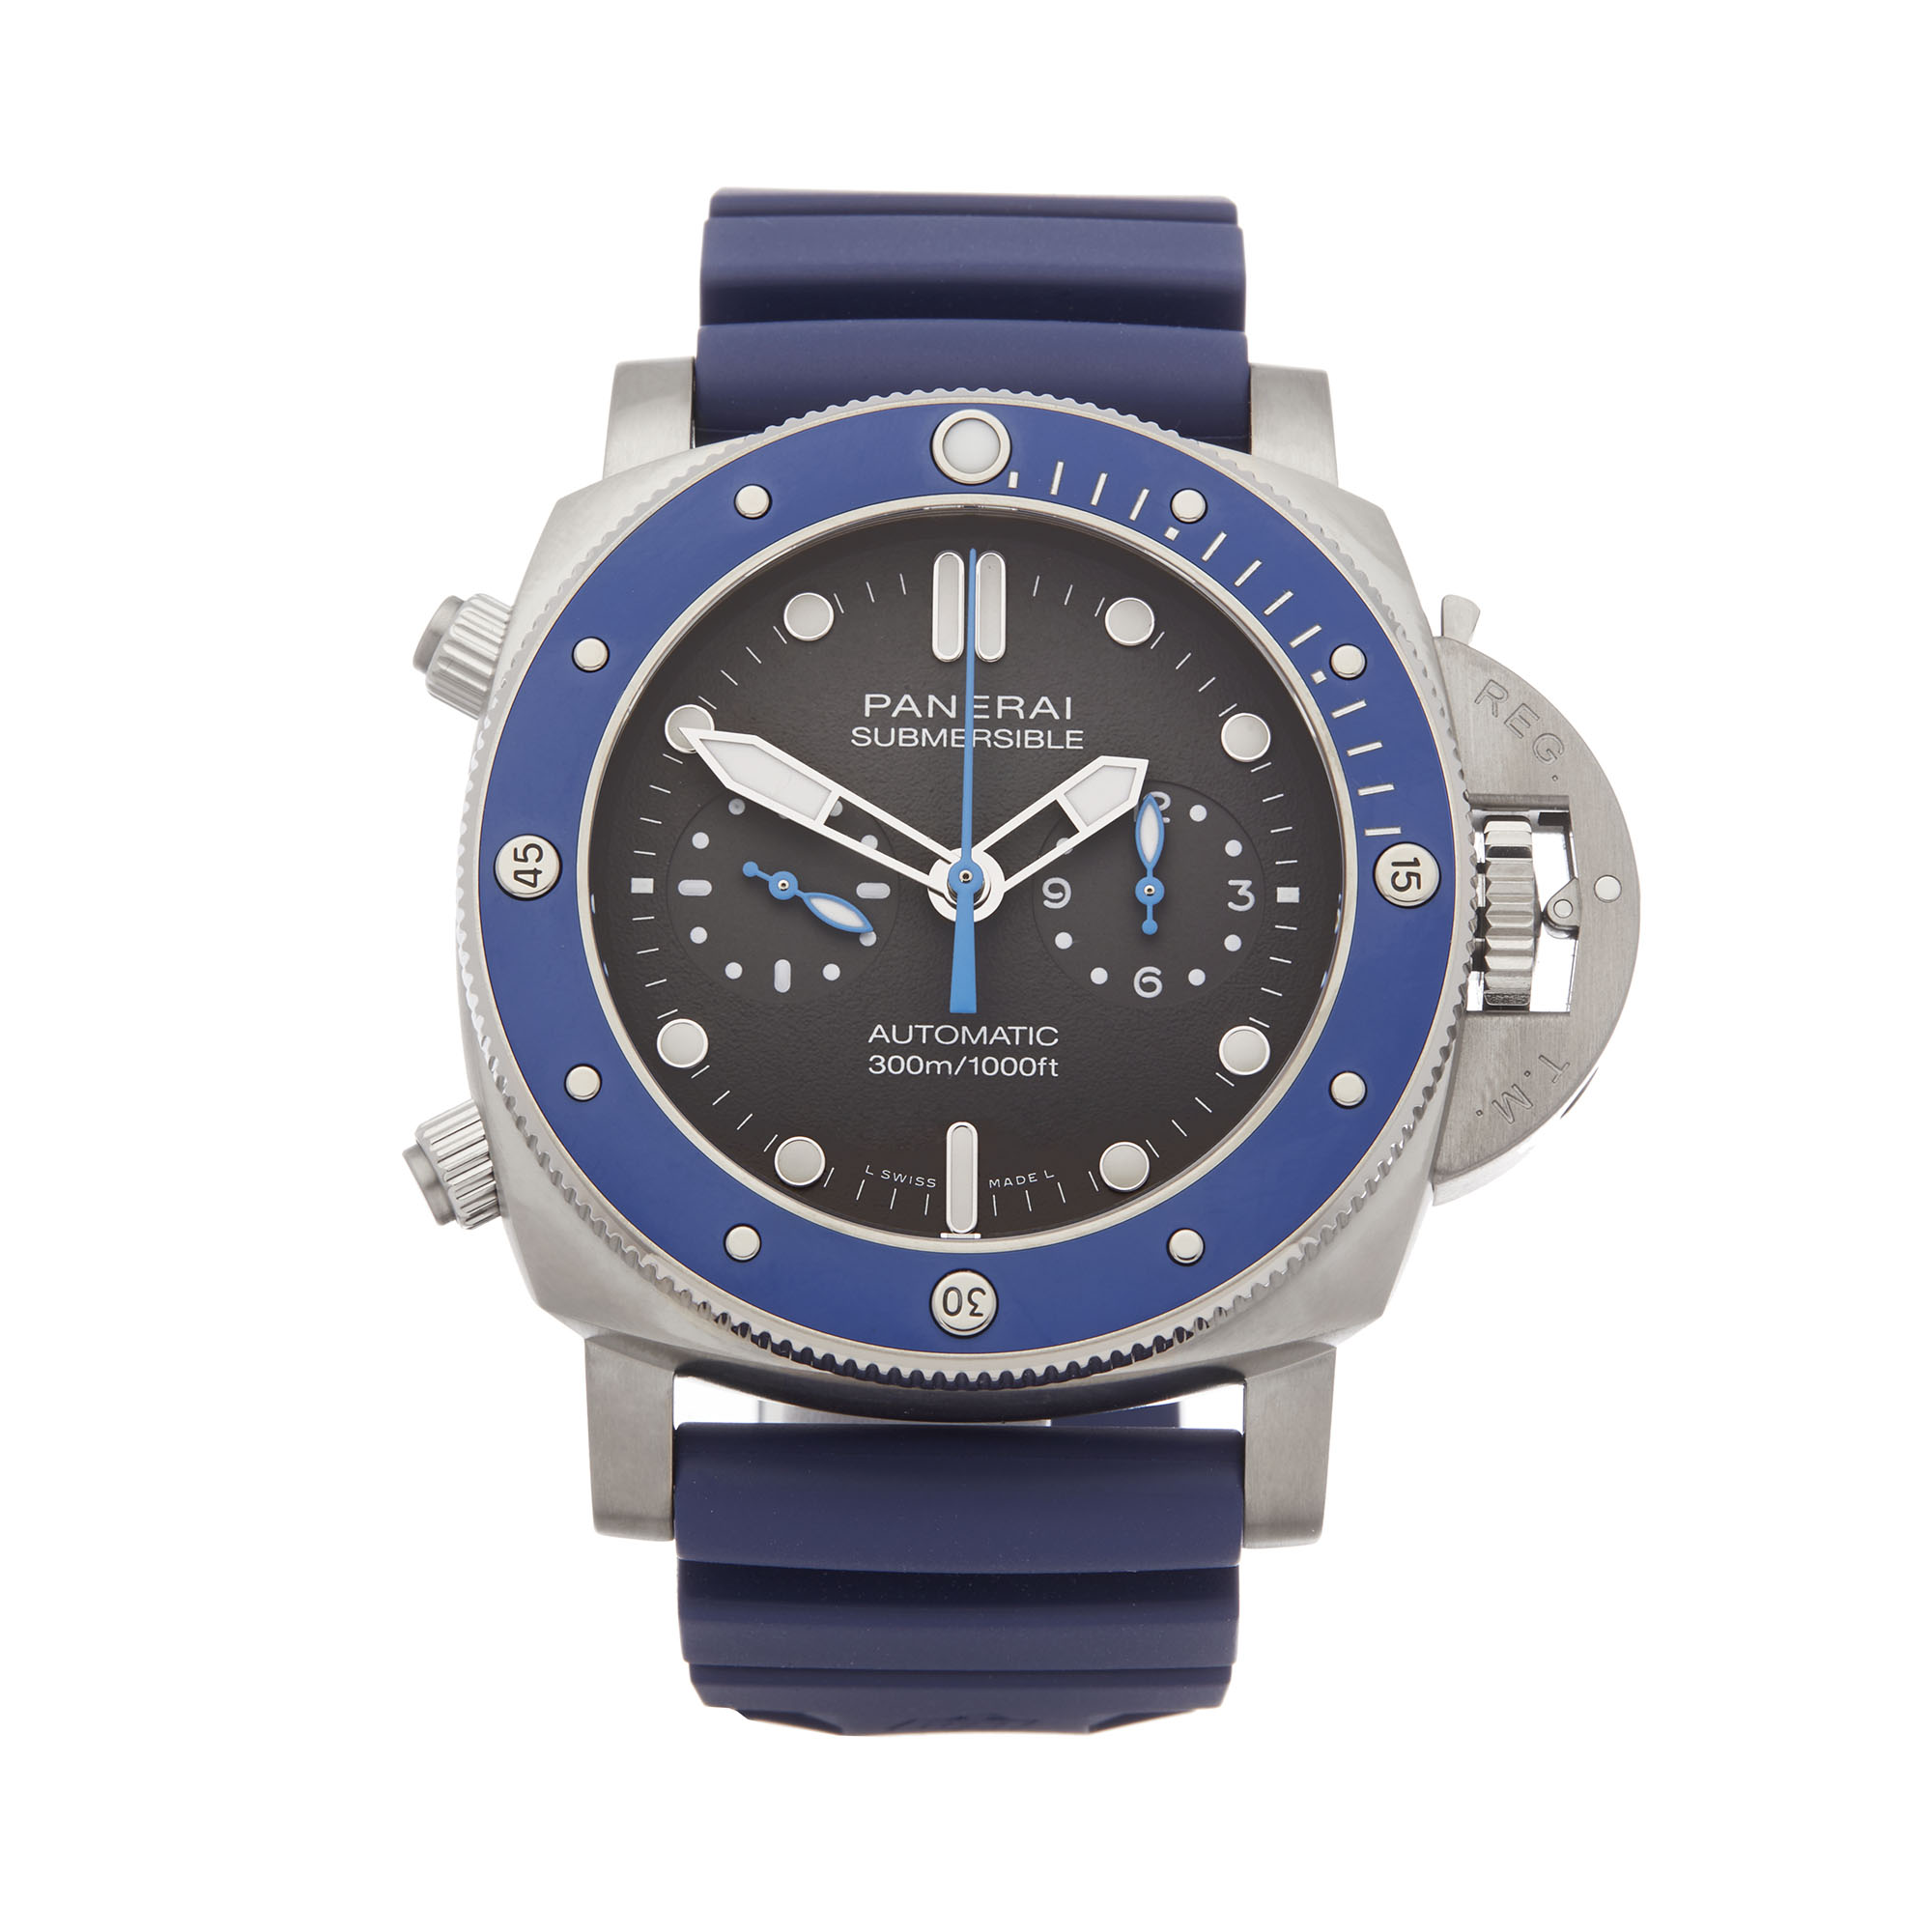 Panerai Luminor Submersible PAM00982 Men Stainless Steel Chronograph Watch - Image 8 of 8